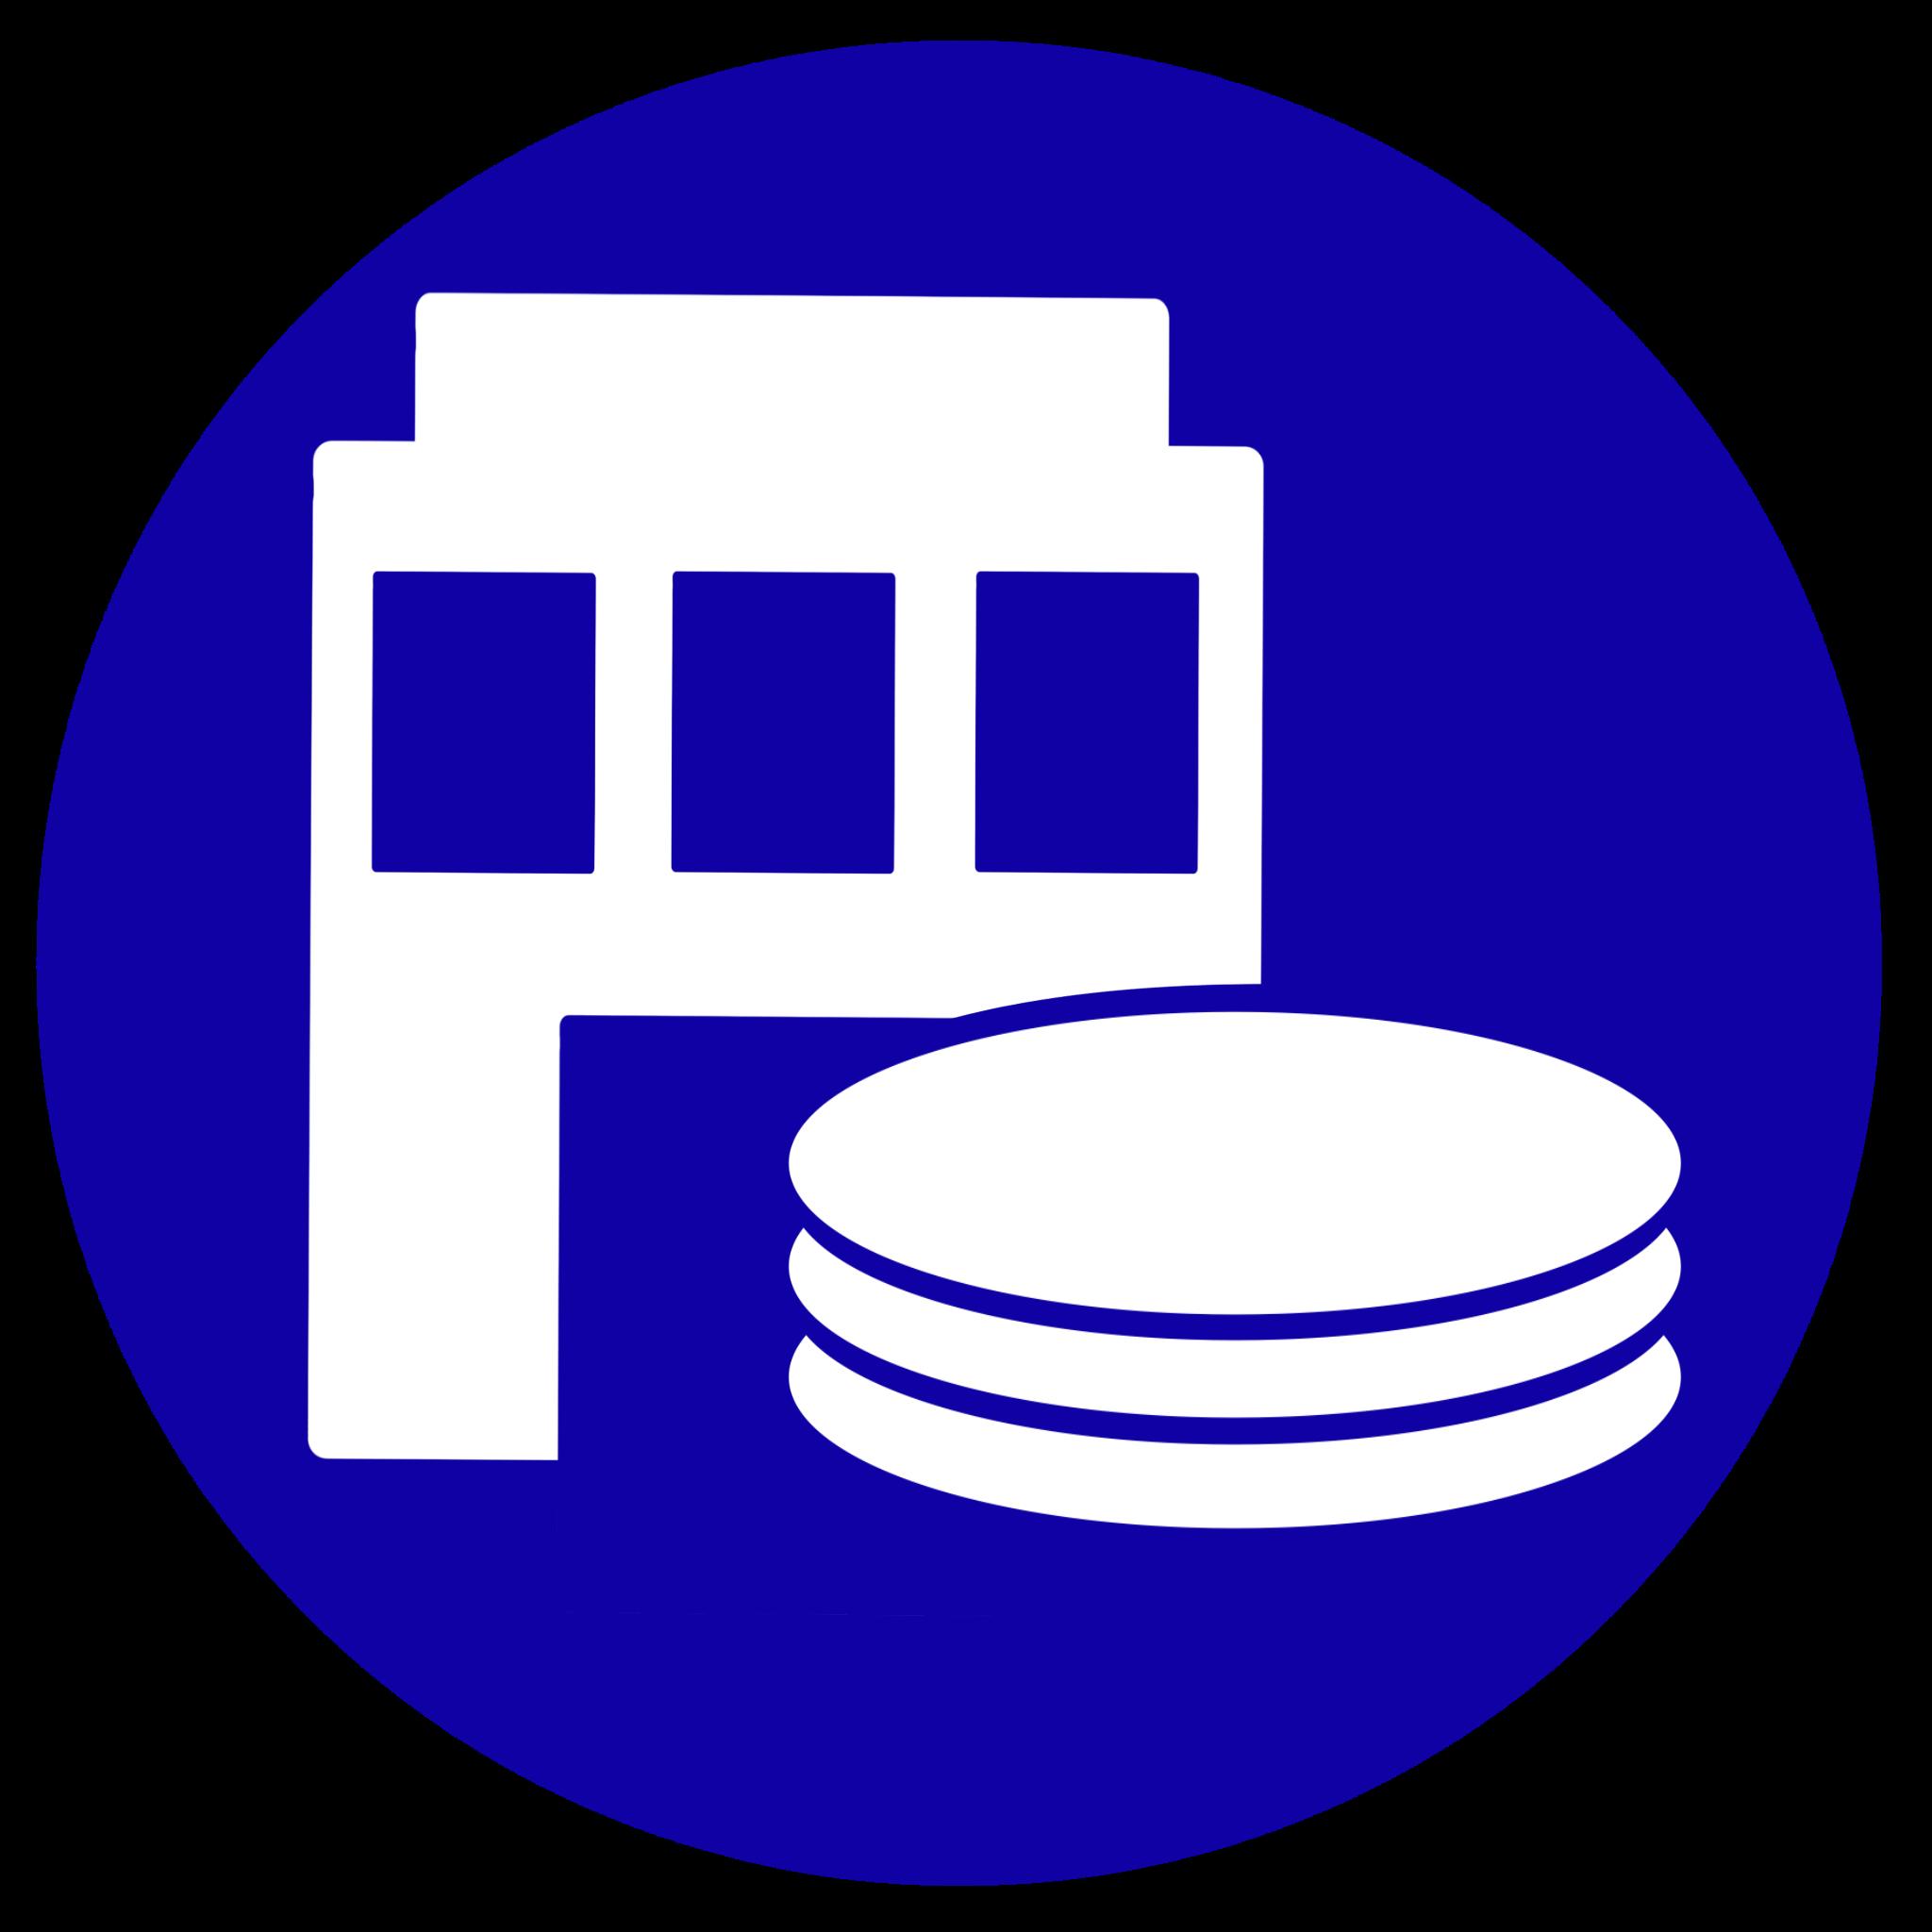 Icono que representa